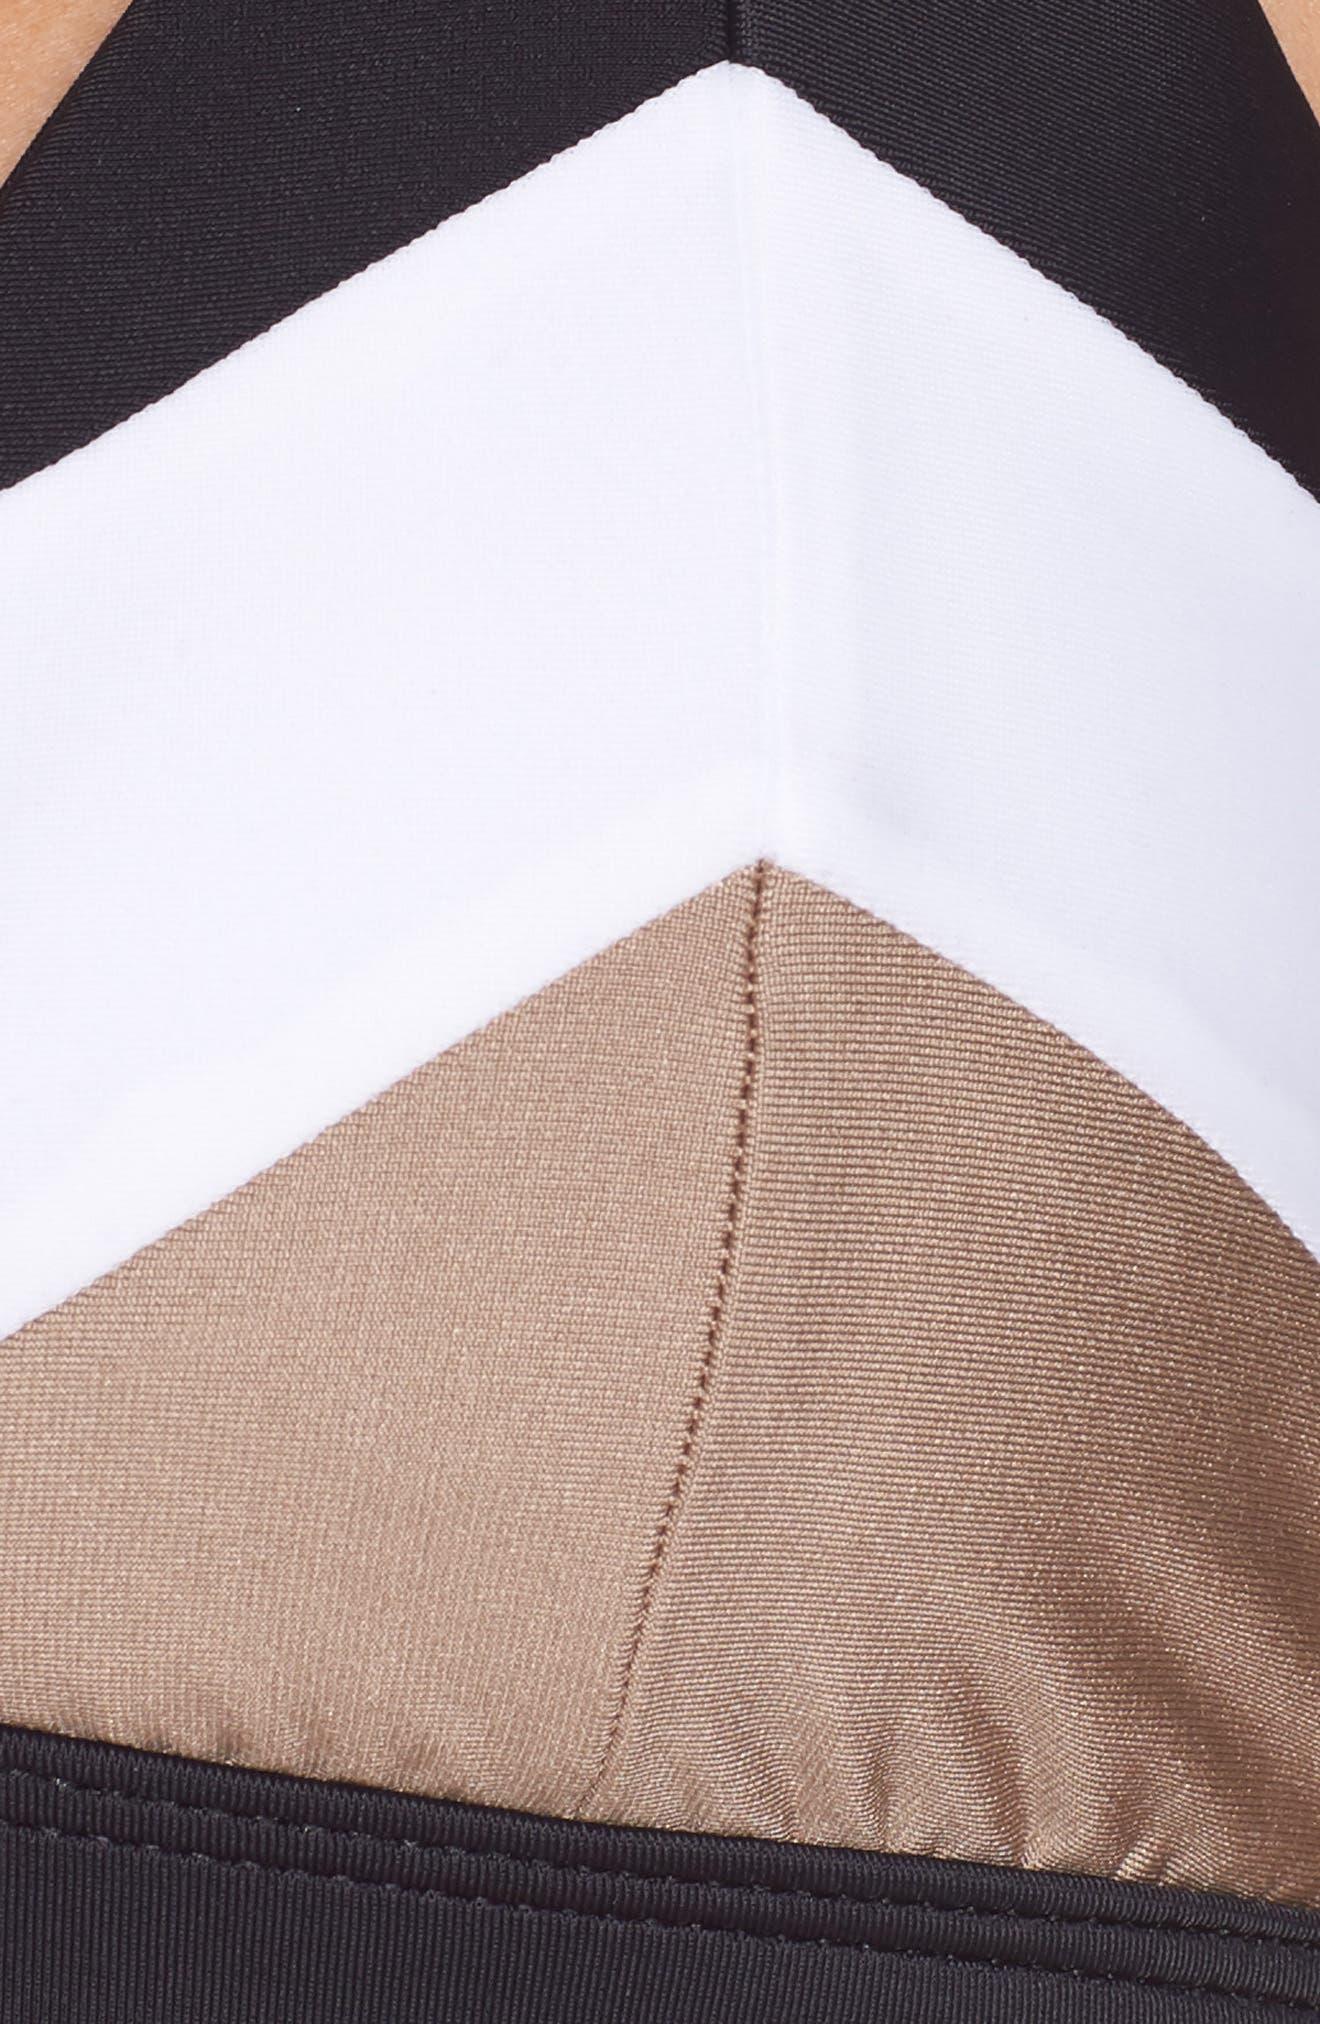 Colorblock Triangle Bikini Top,                             Alternate thumbnail 8, color,                             Cadillac